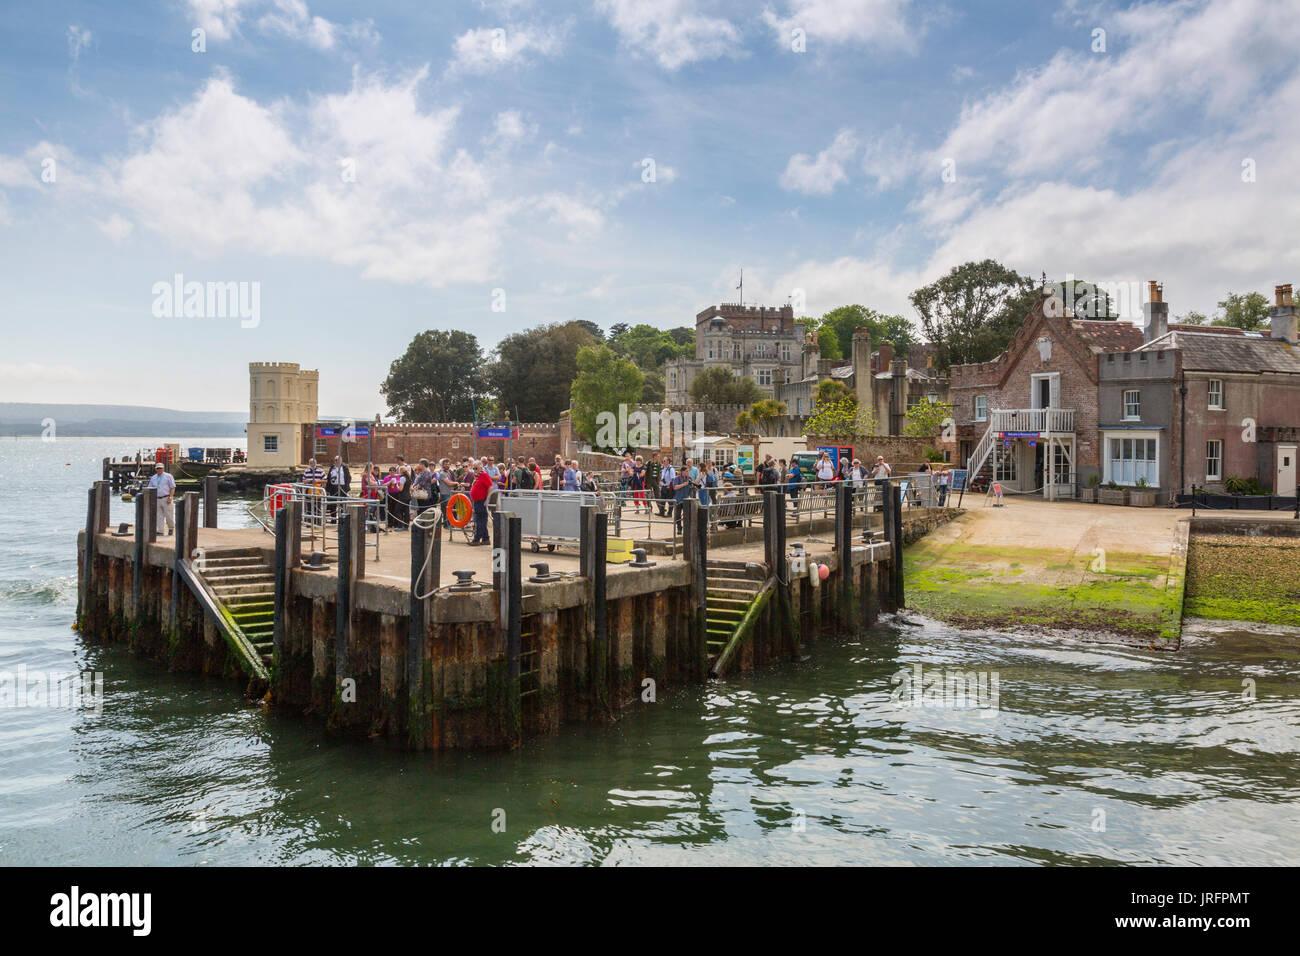 Brownsea Island Ferries Poole Quay Kiosk Poole